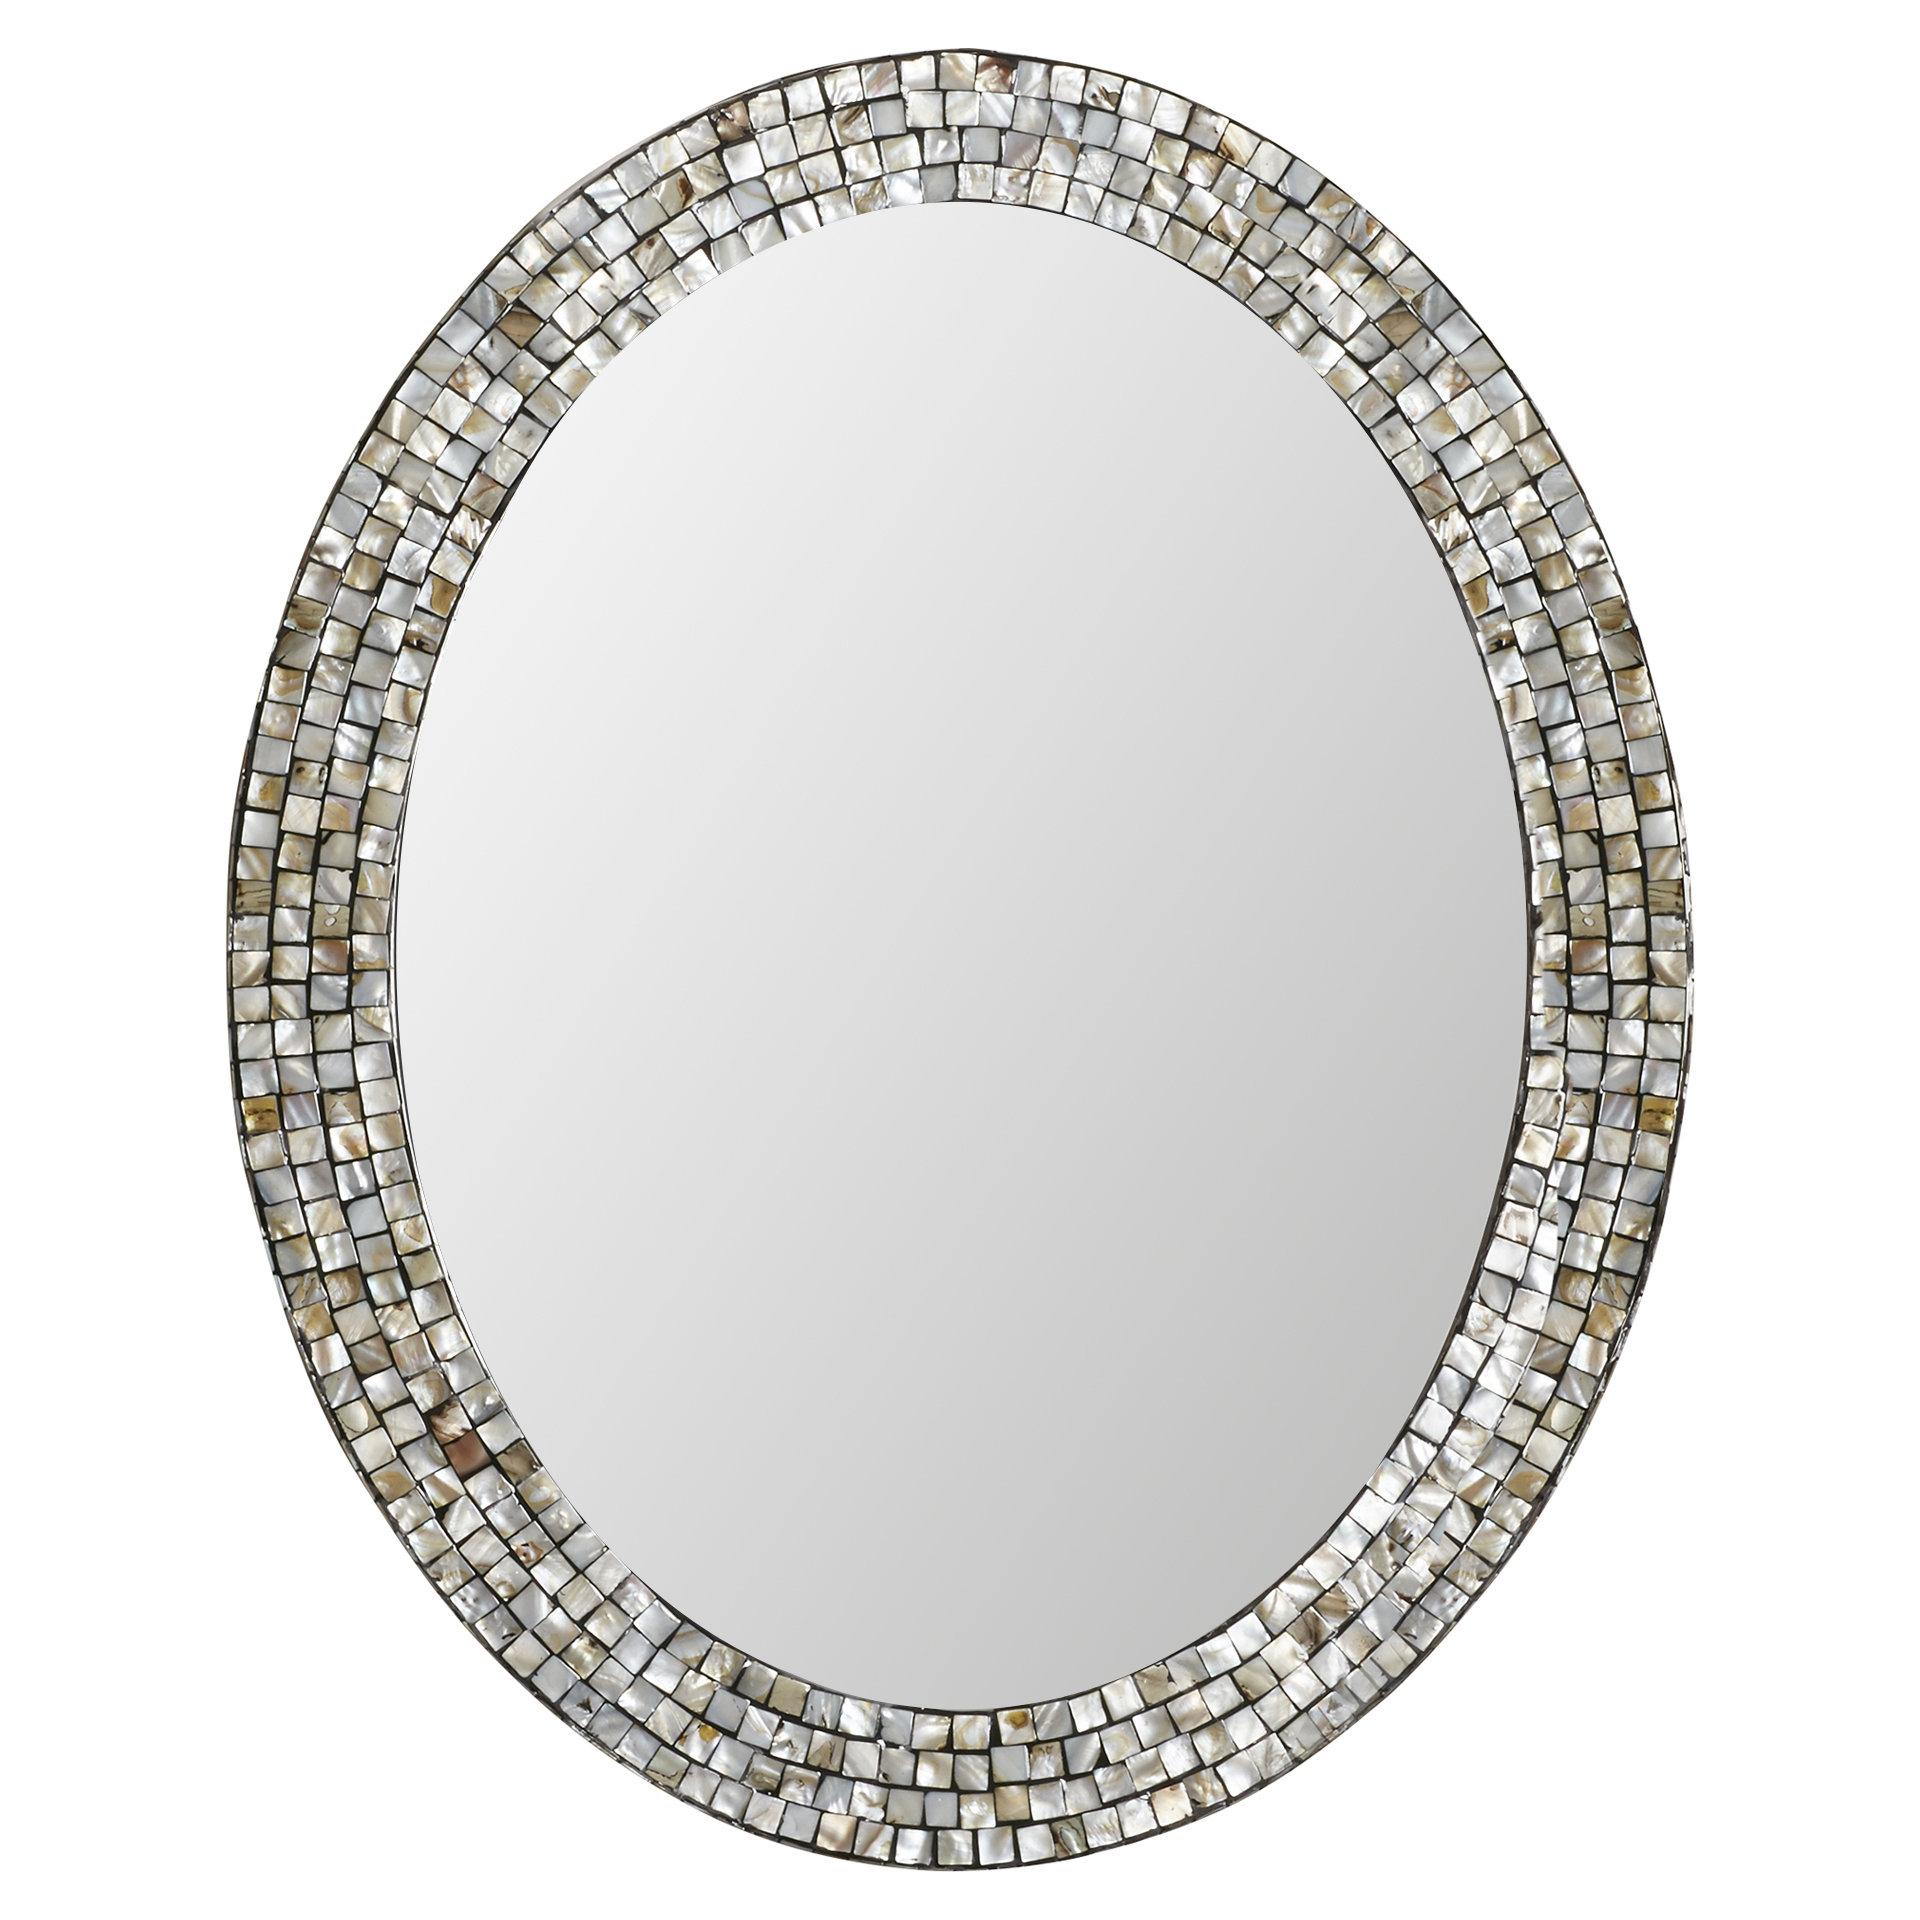 2020 Sajish Oval Crystal Wall Mirrors Regarding Dawson Wall Mirror (View 14 of 20)